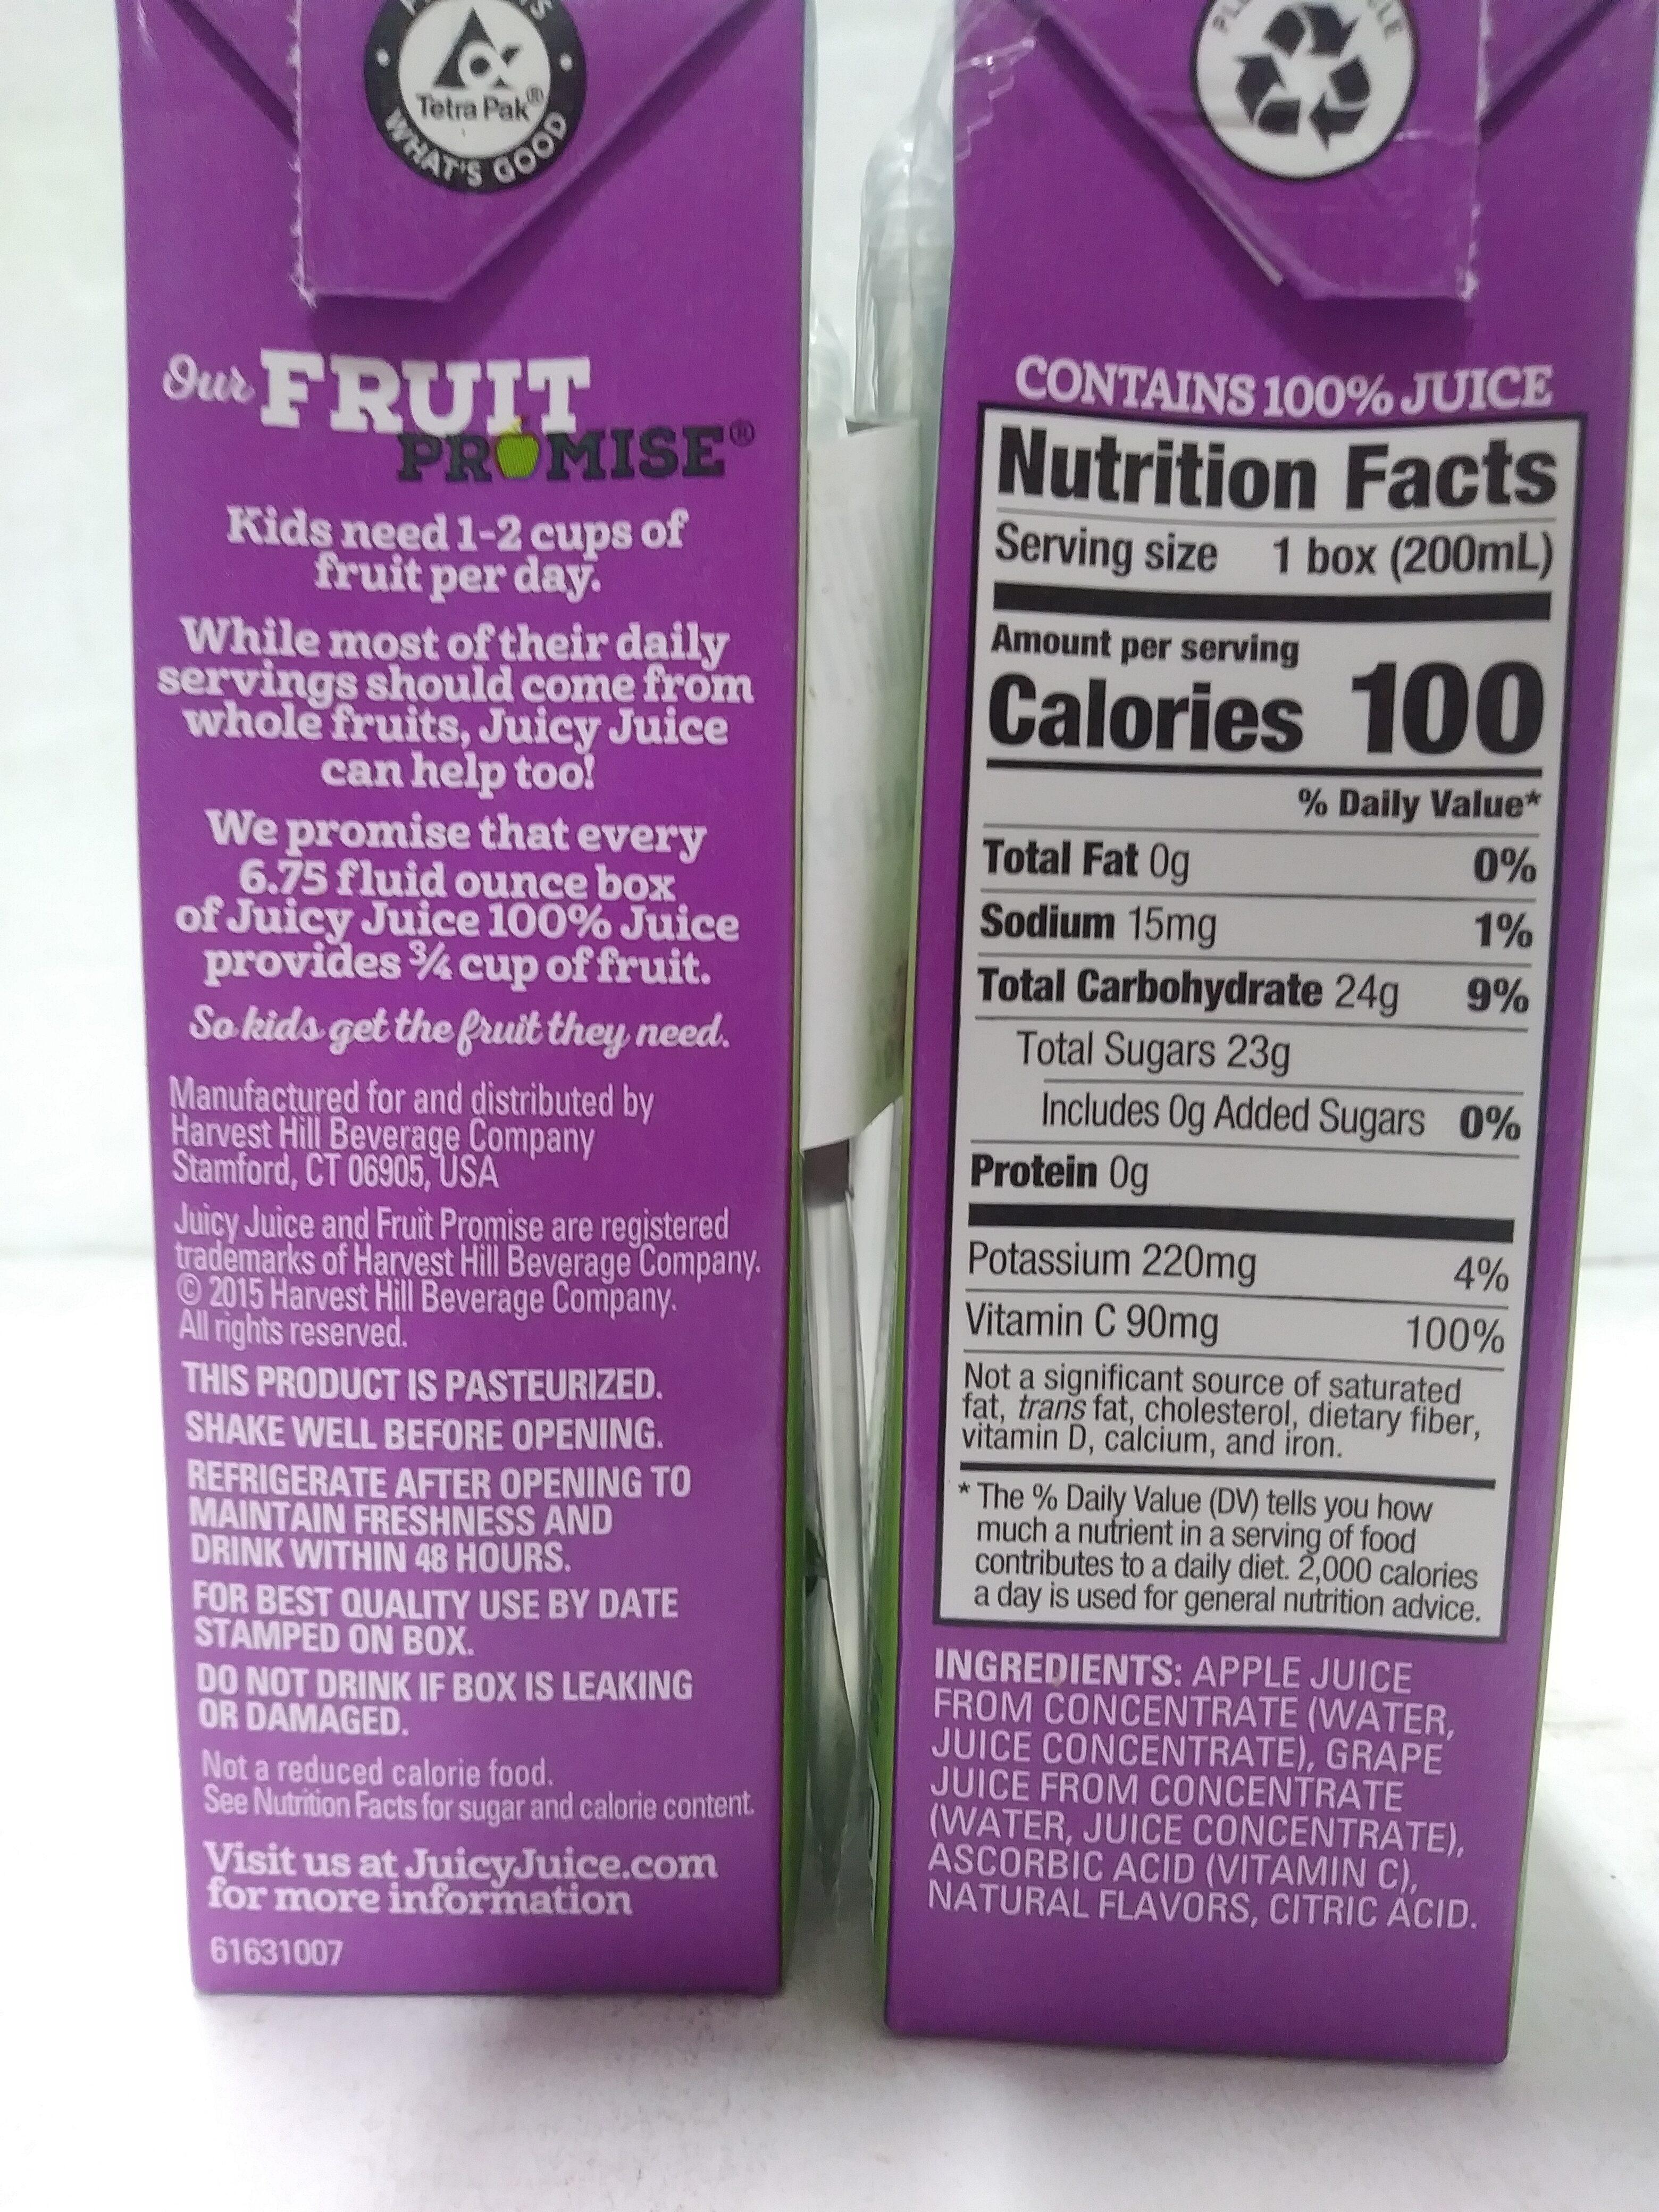 Grape Juice from Concentrate - Valori nutrizionali - en